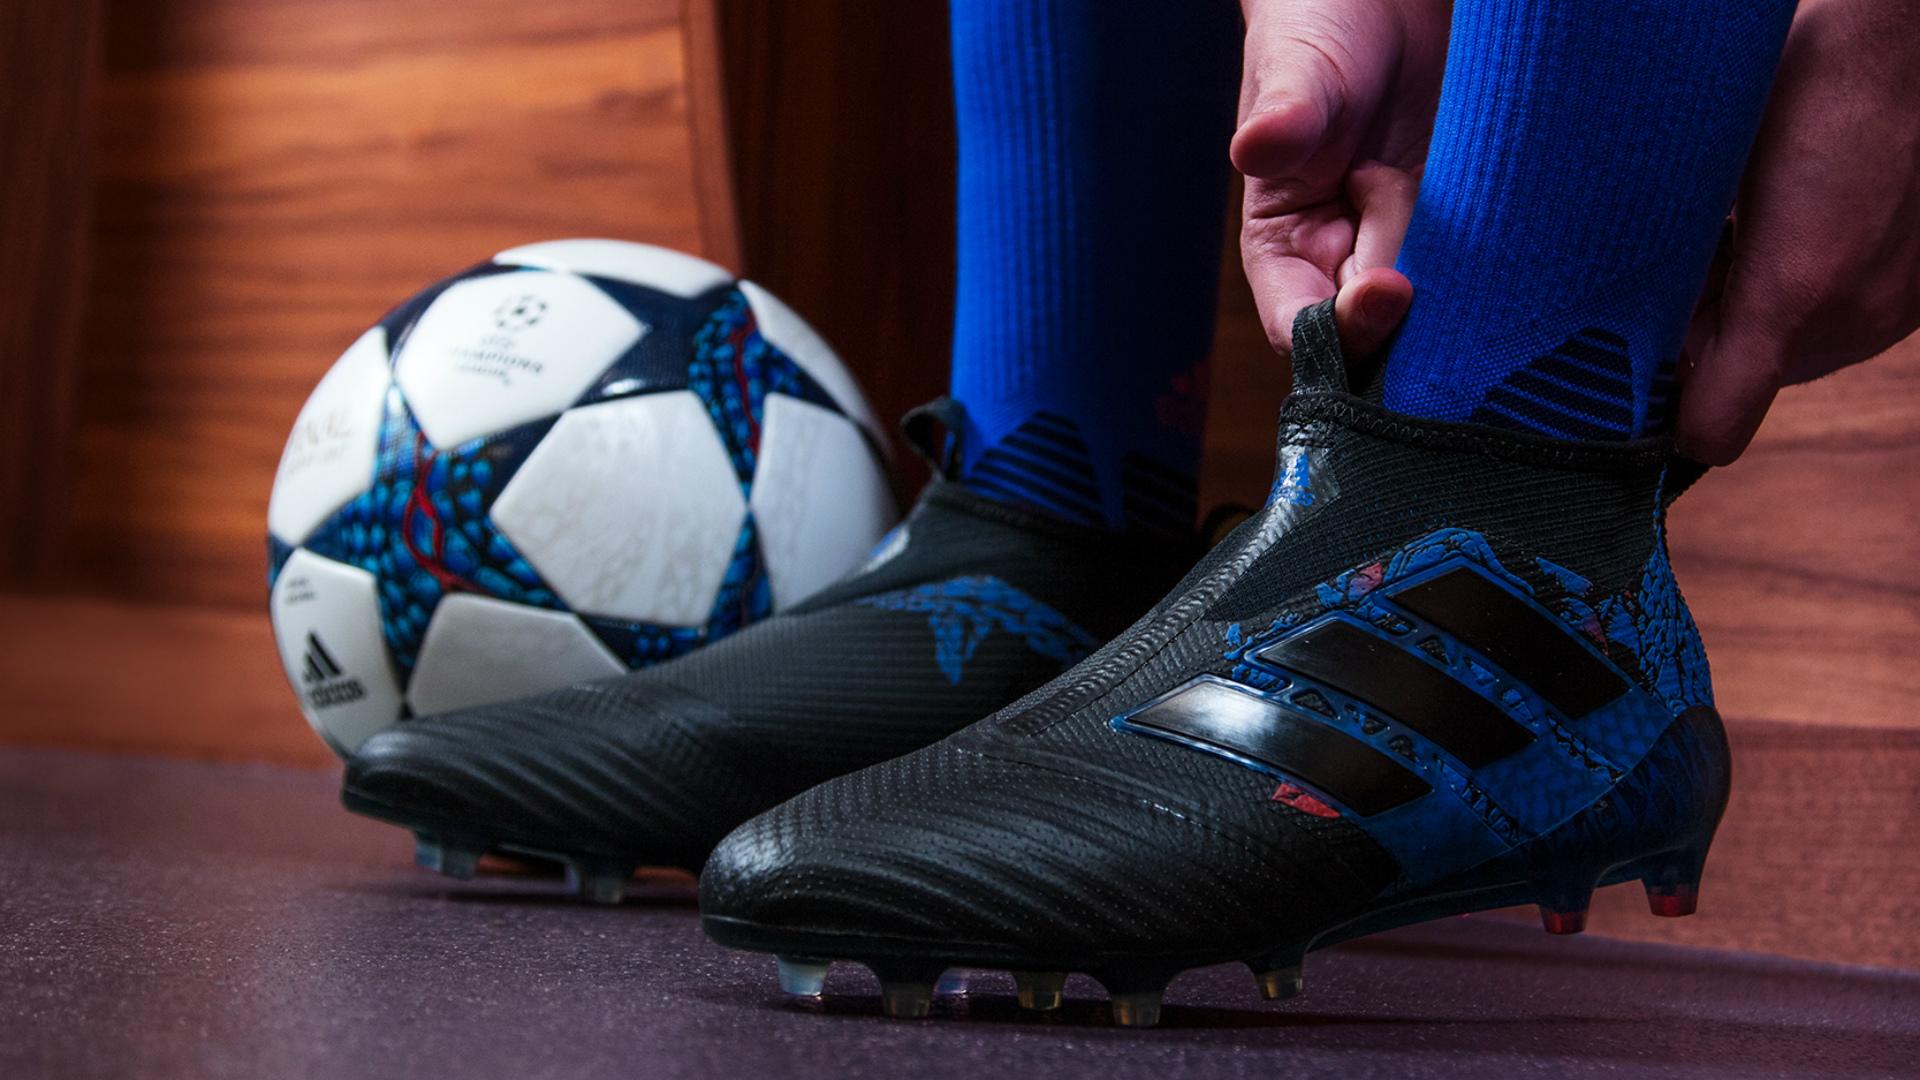 FOTOS - Así es el balón de la final de la UEFA Champions League ... 408373aa73f74